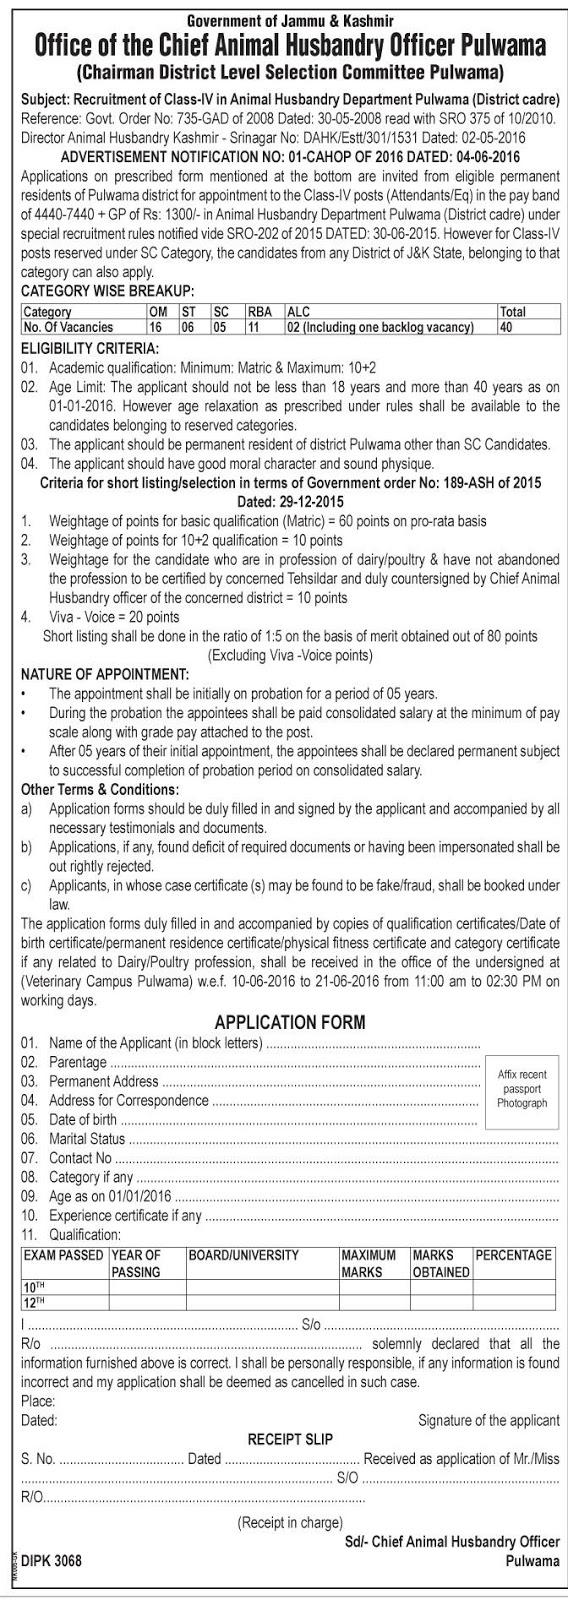 Animal Husbandry Pulwama Recruitment – 40 Class-IV Posts